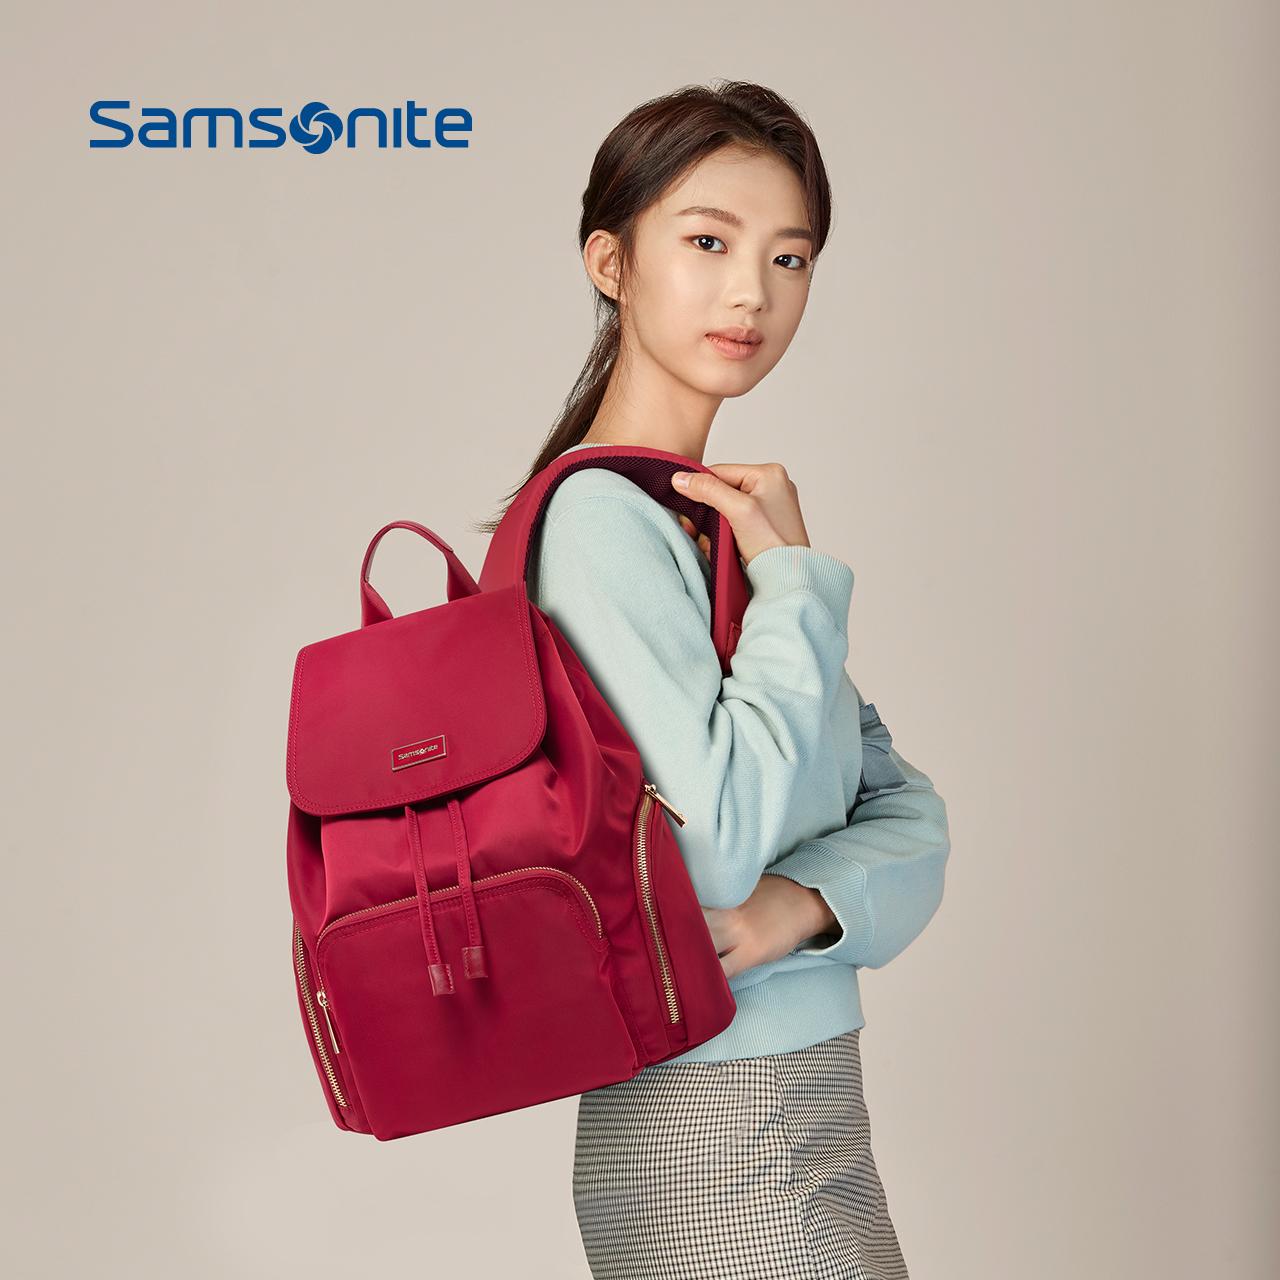 Samsonite/新秀丽2019新款双肩包女小包 尼龙时尚韩版高中书包TQ4图片